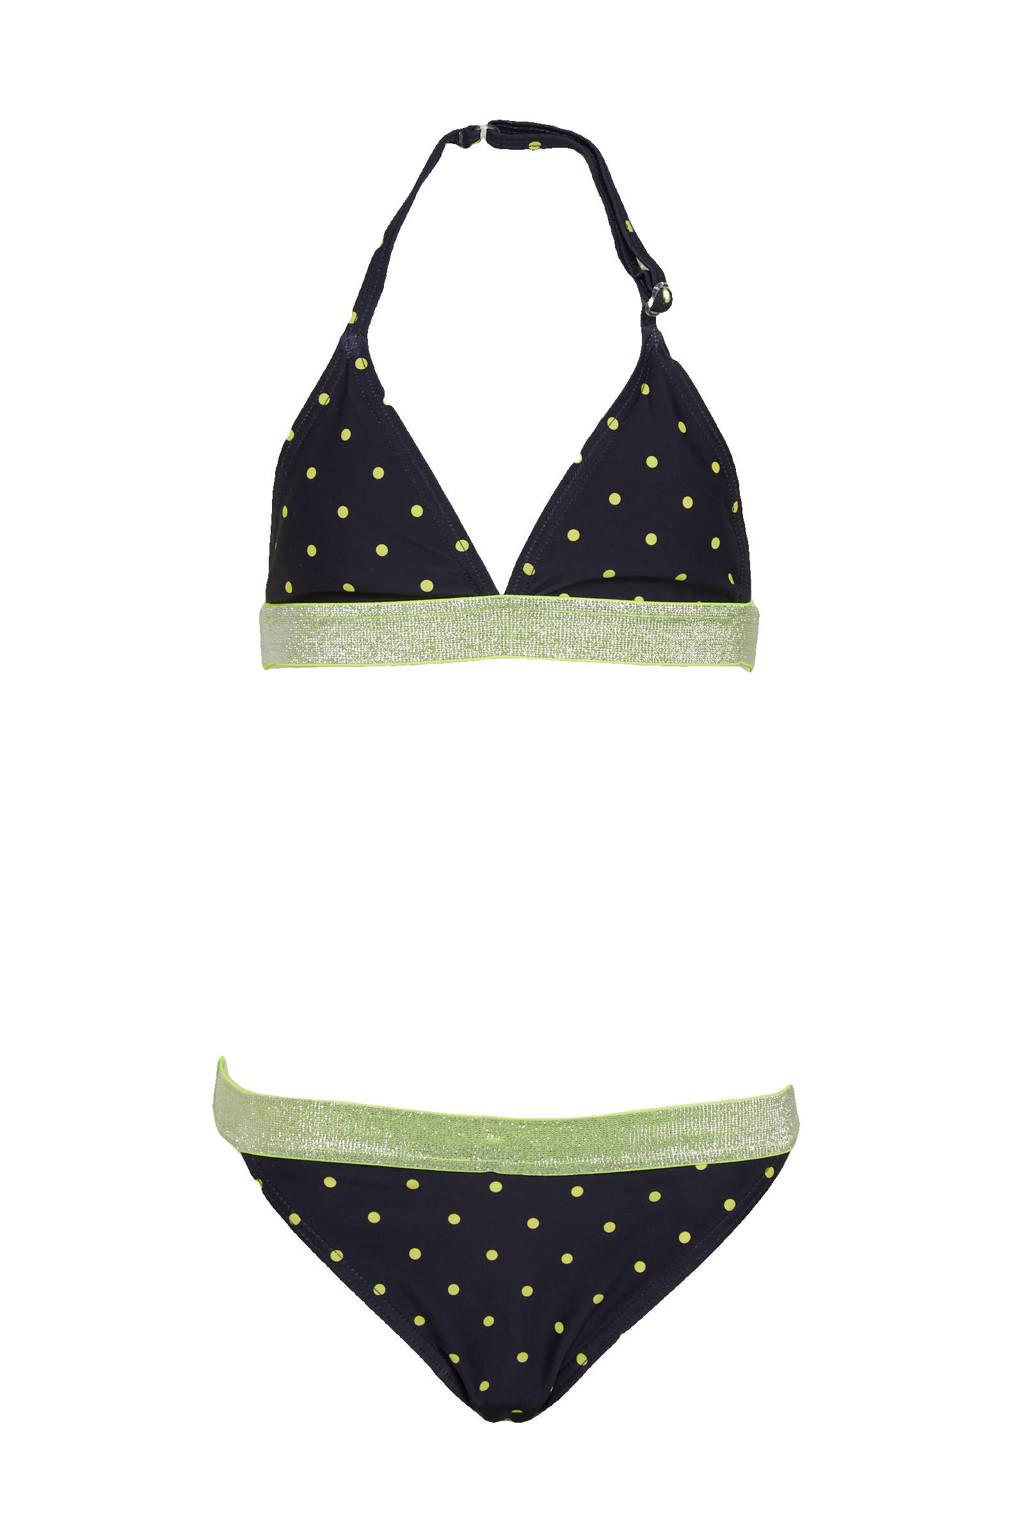 NAME IT KIDS triangel bikini Zeleste met stippen donkerblauw/geel, Donkerblauw/geel